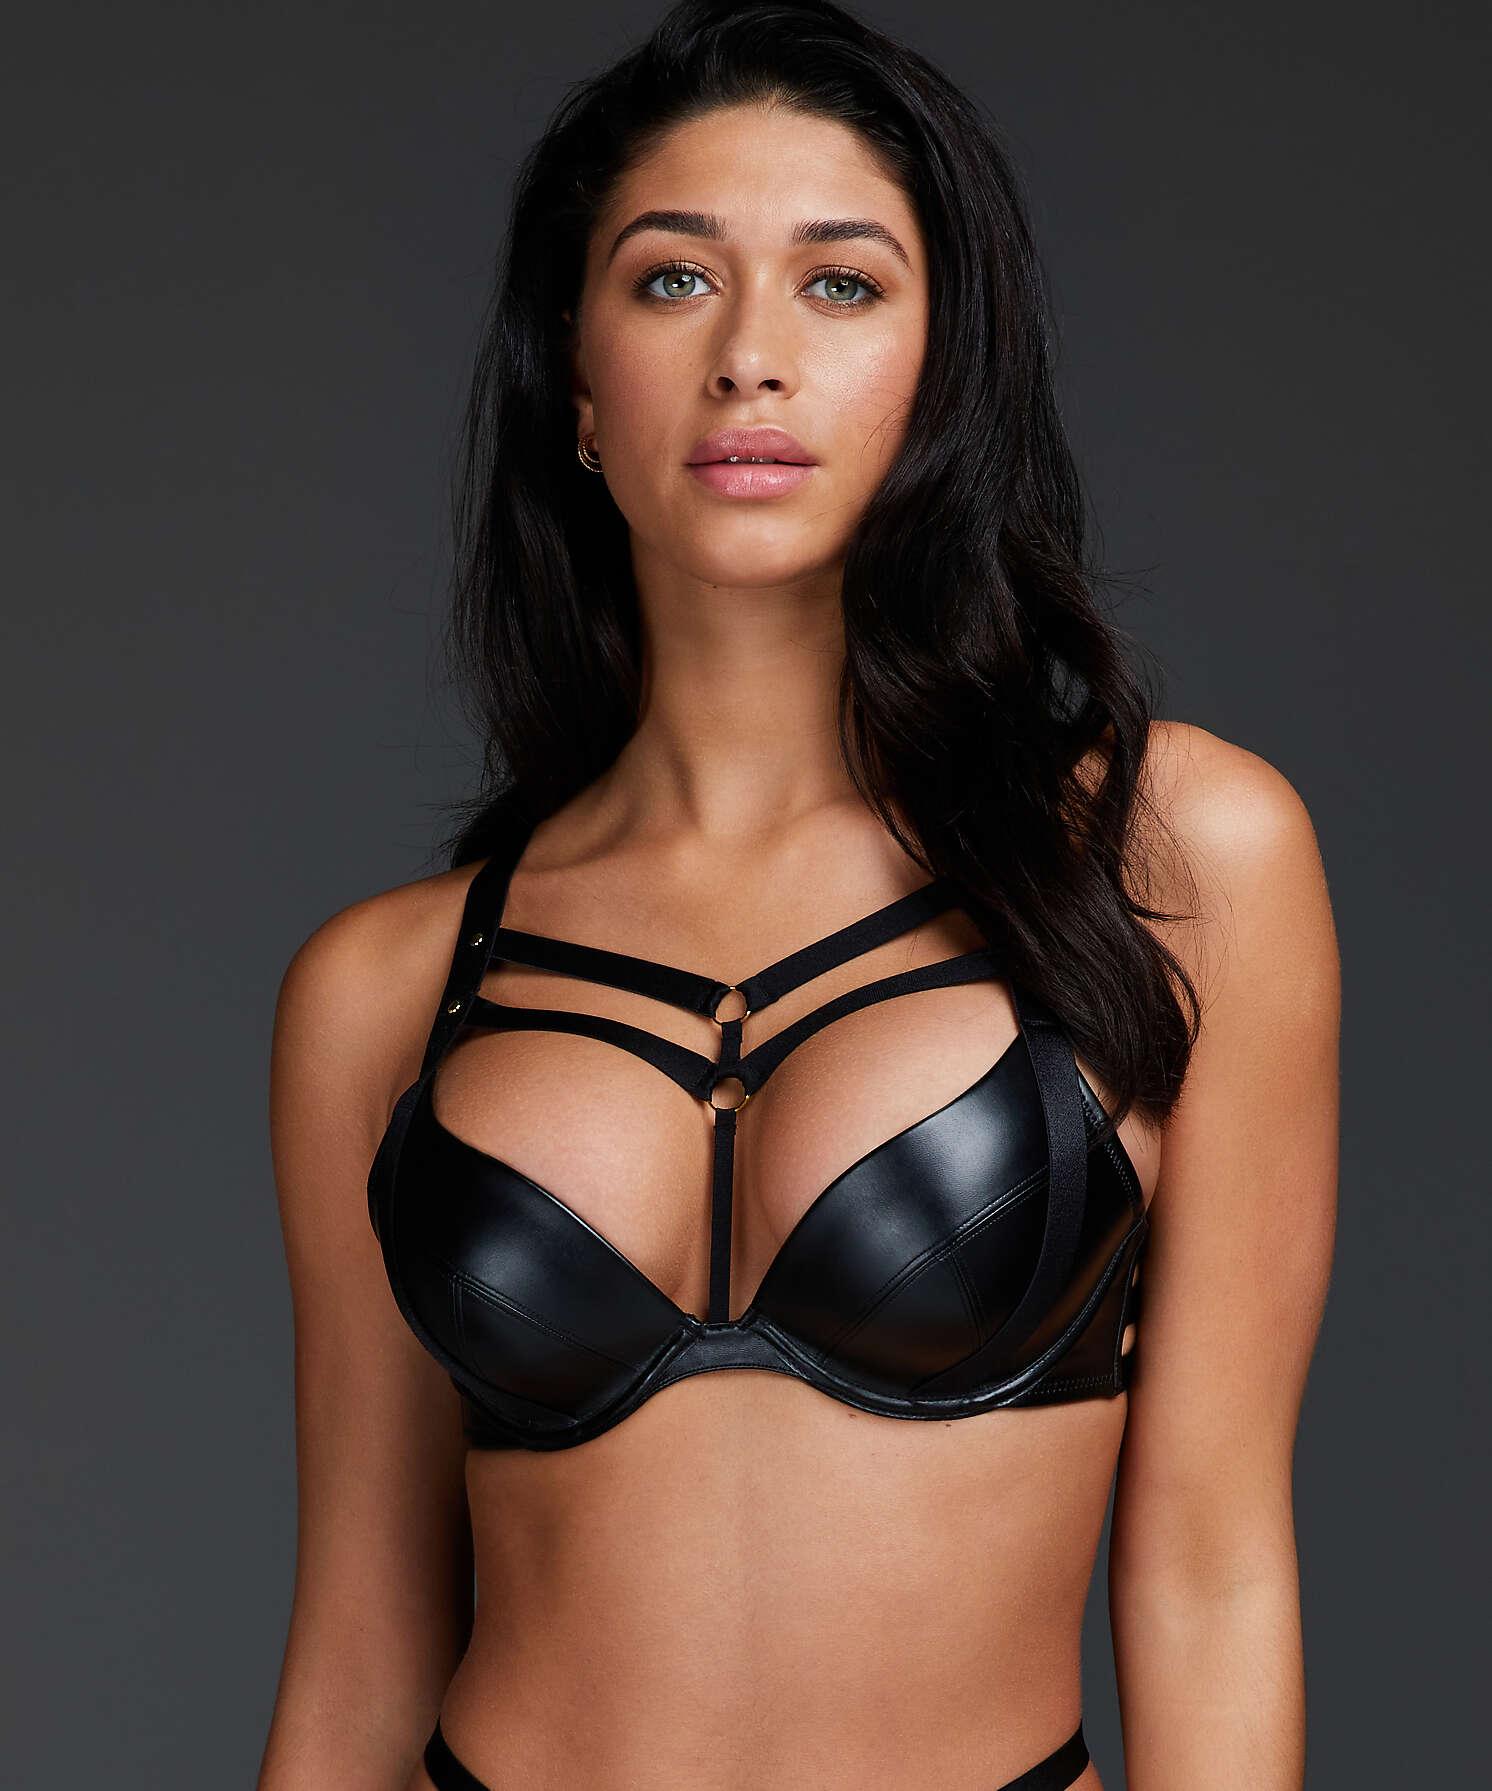 Shadow padded push-up underwired bra, Black, main